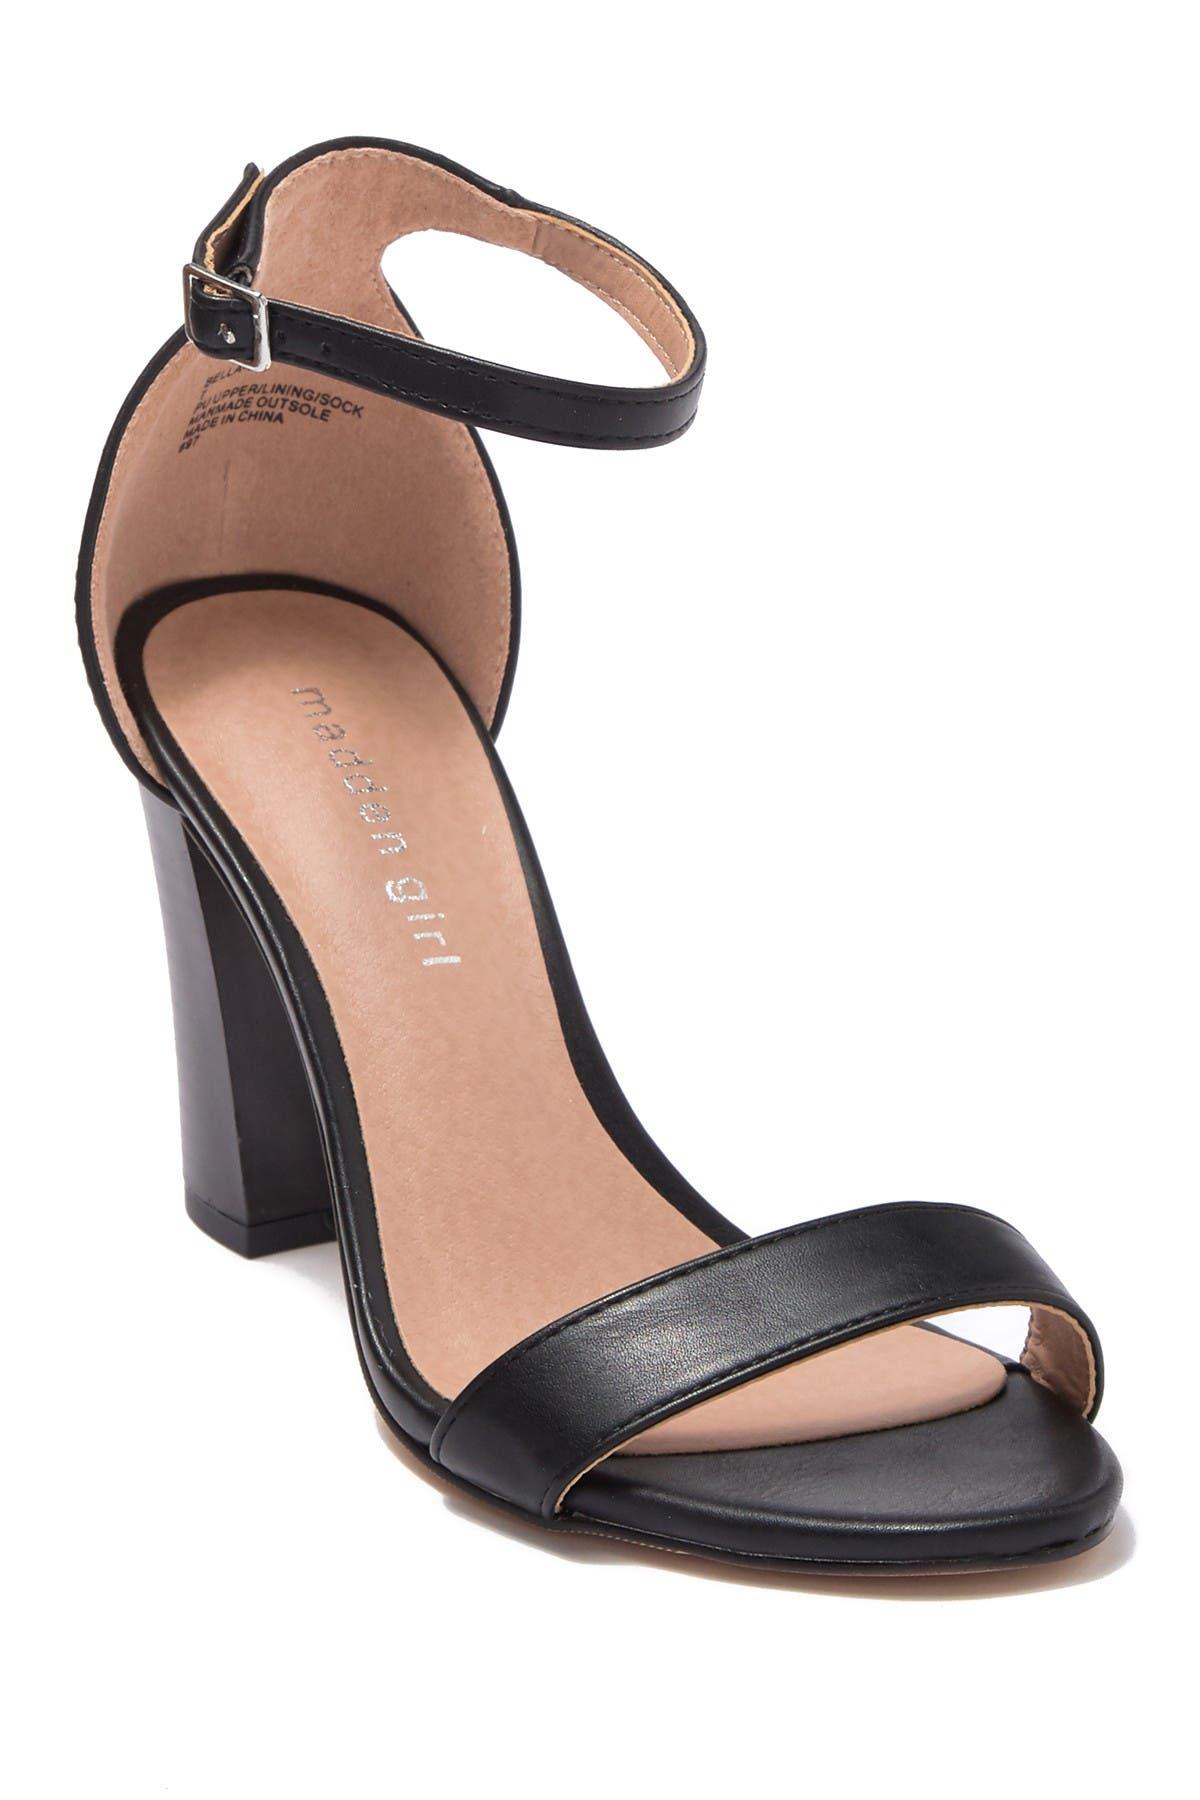 Madden Girl | Bella Block Heel Sandal